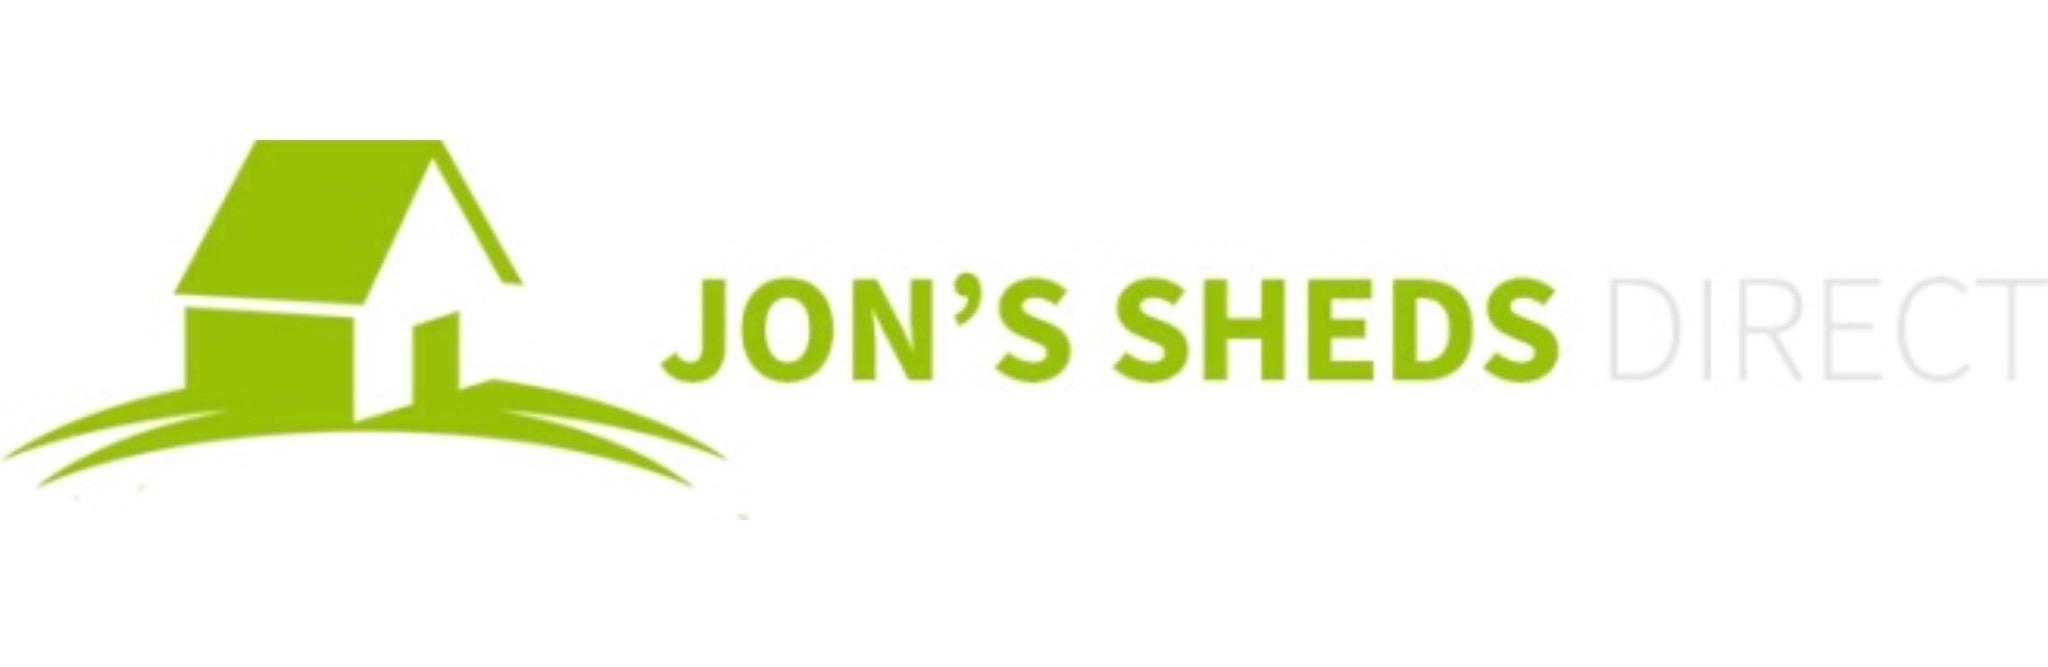 Jon's Sheds Direct